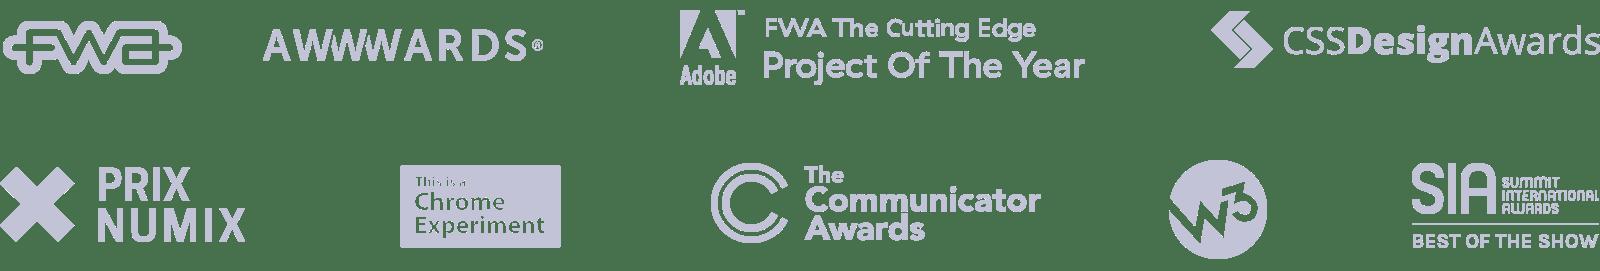 Awards list image